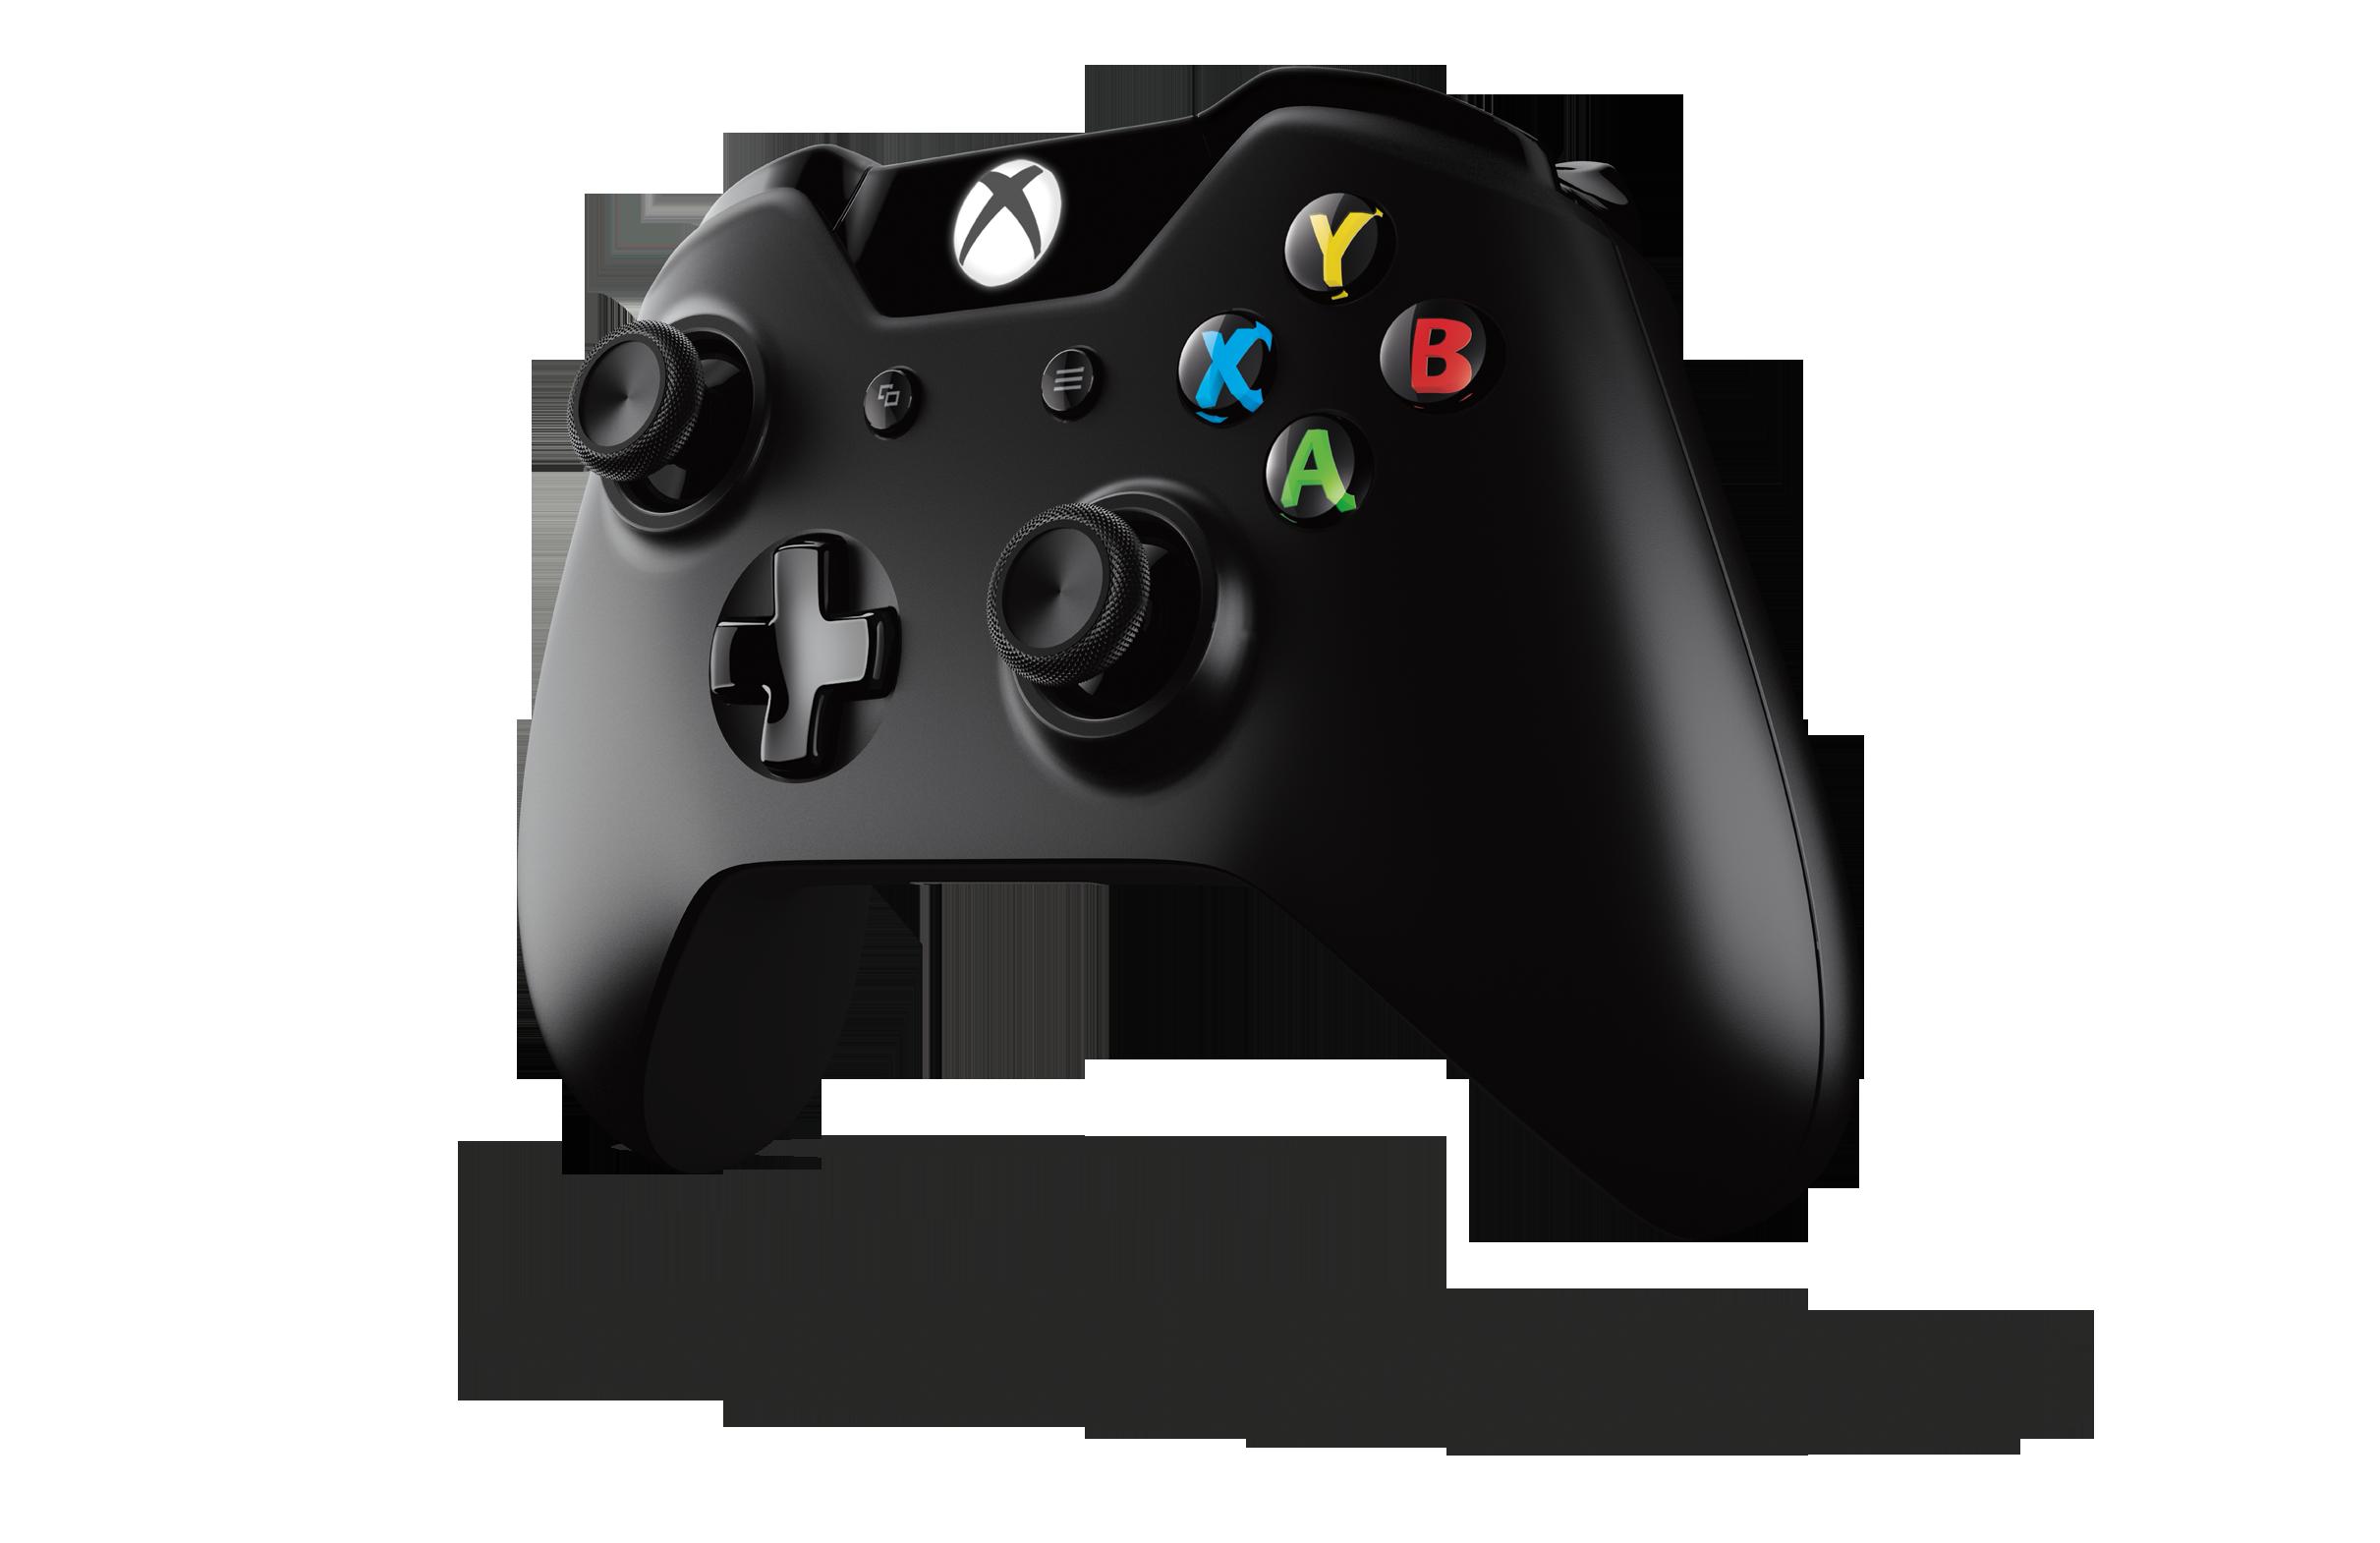 Xbox_Controller_RHS78_TransBG_RGB_2013.png (2422×1570)